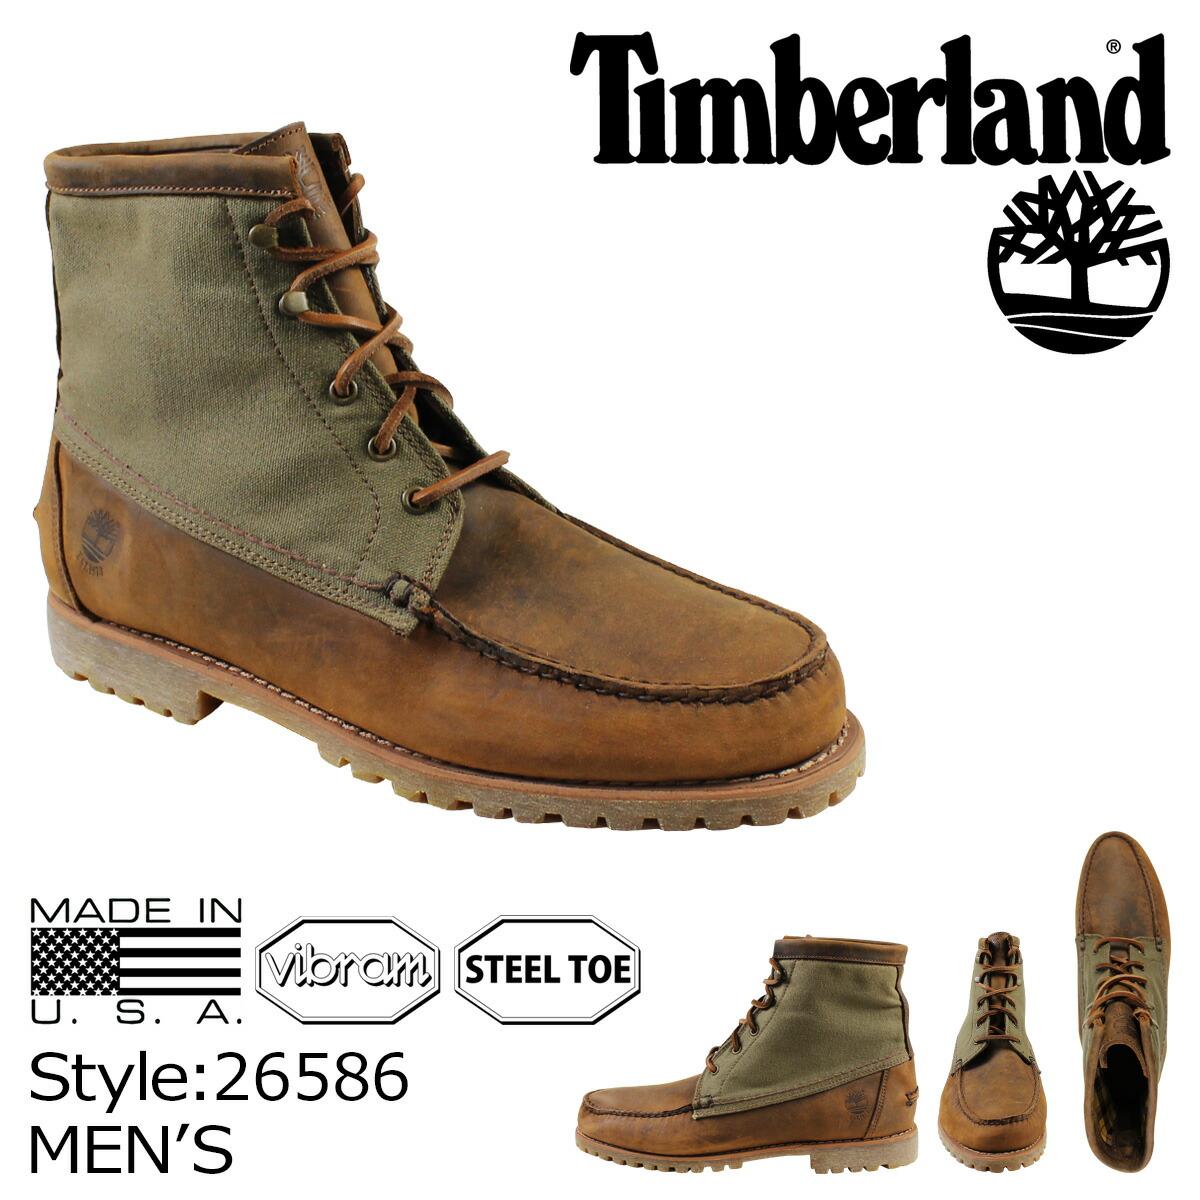 sale retailer f2b09 882e3 ... stussy deluxe x timberland gore tex chukka boot (september 2011) ...